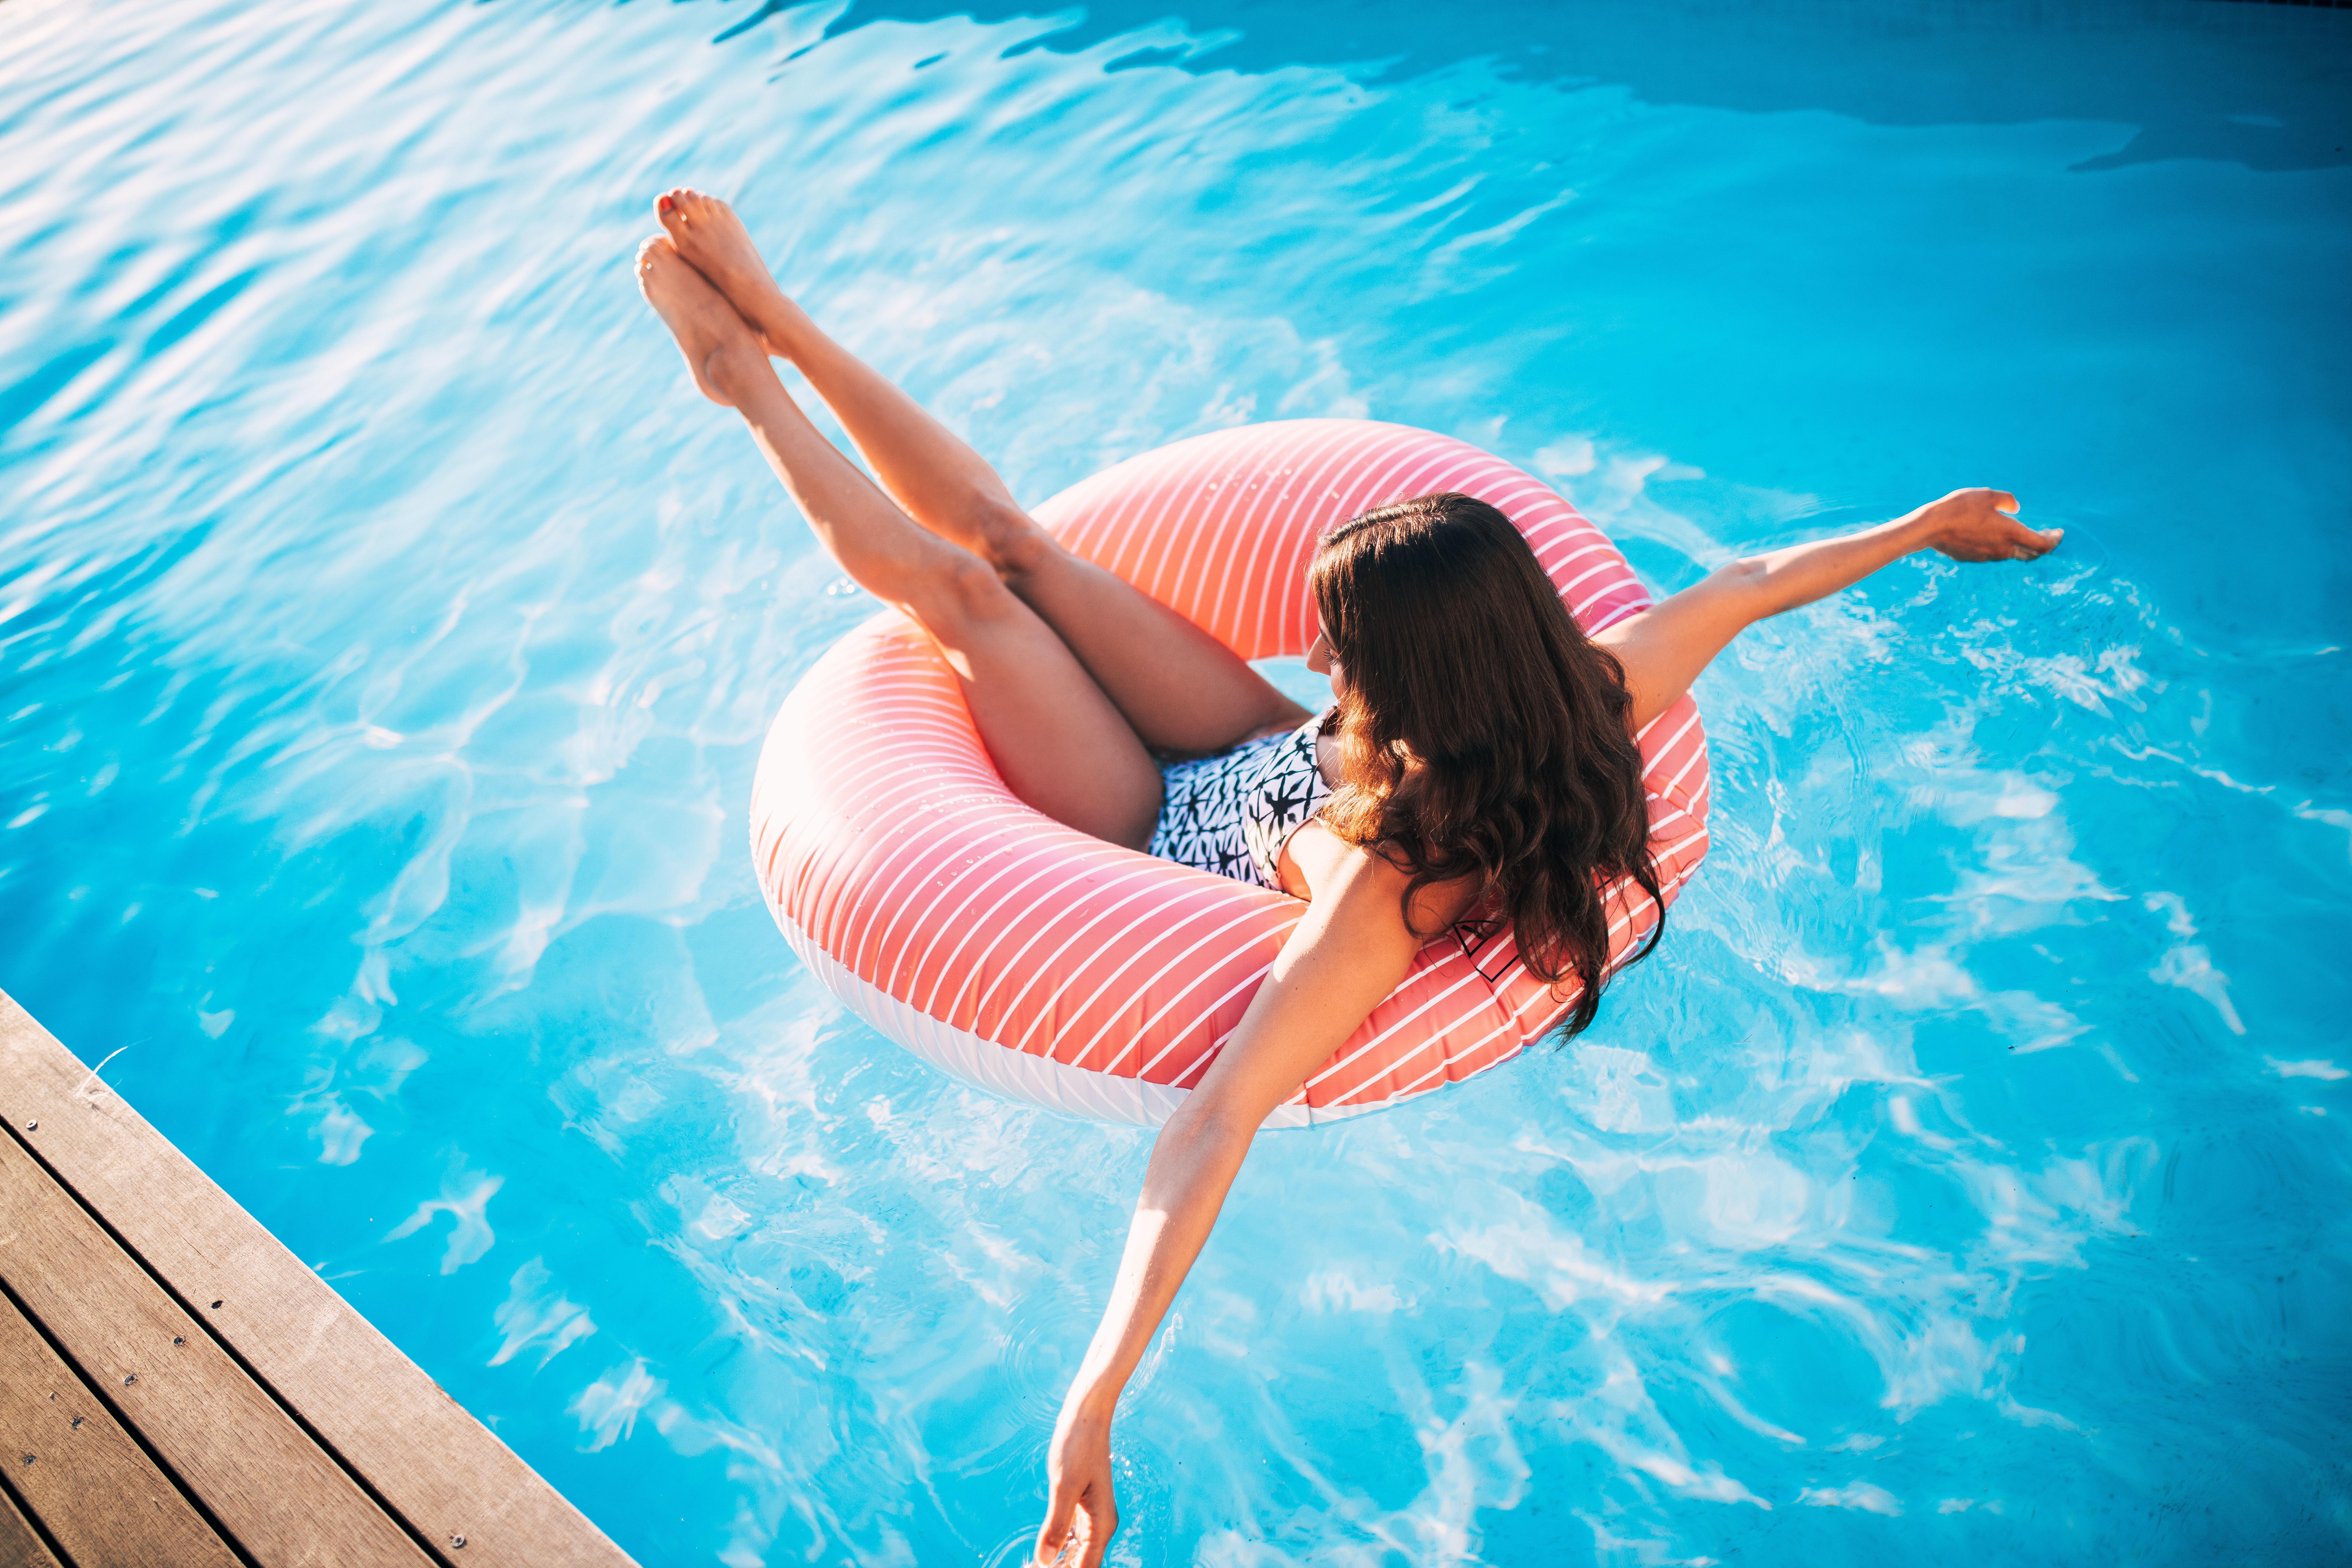 pink-swimming-water-summer-girl-pool-bikini-swim-ring-inflatable ...